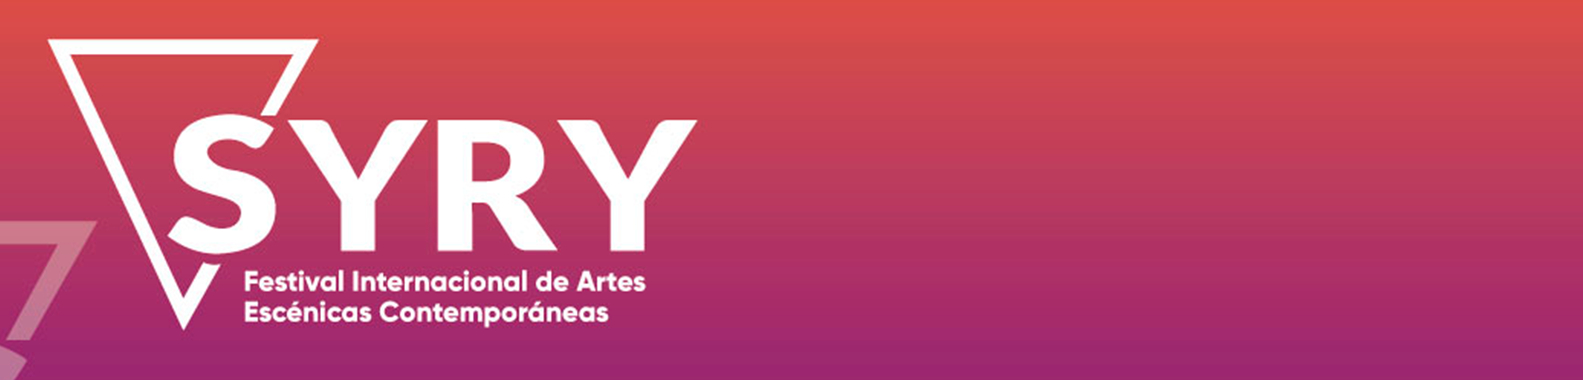 SYRY Festival Internacional de Artes Escénicas Contemporáneas